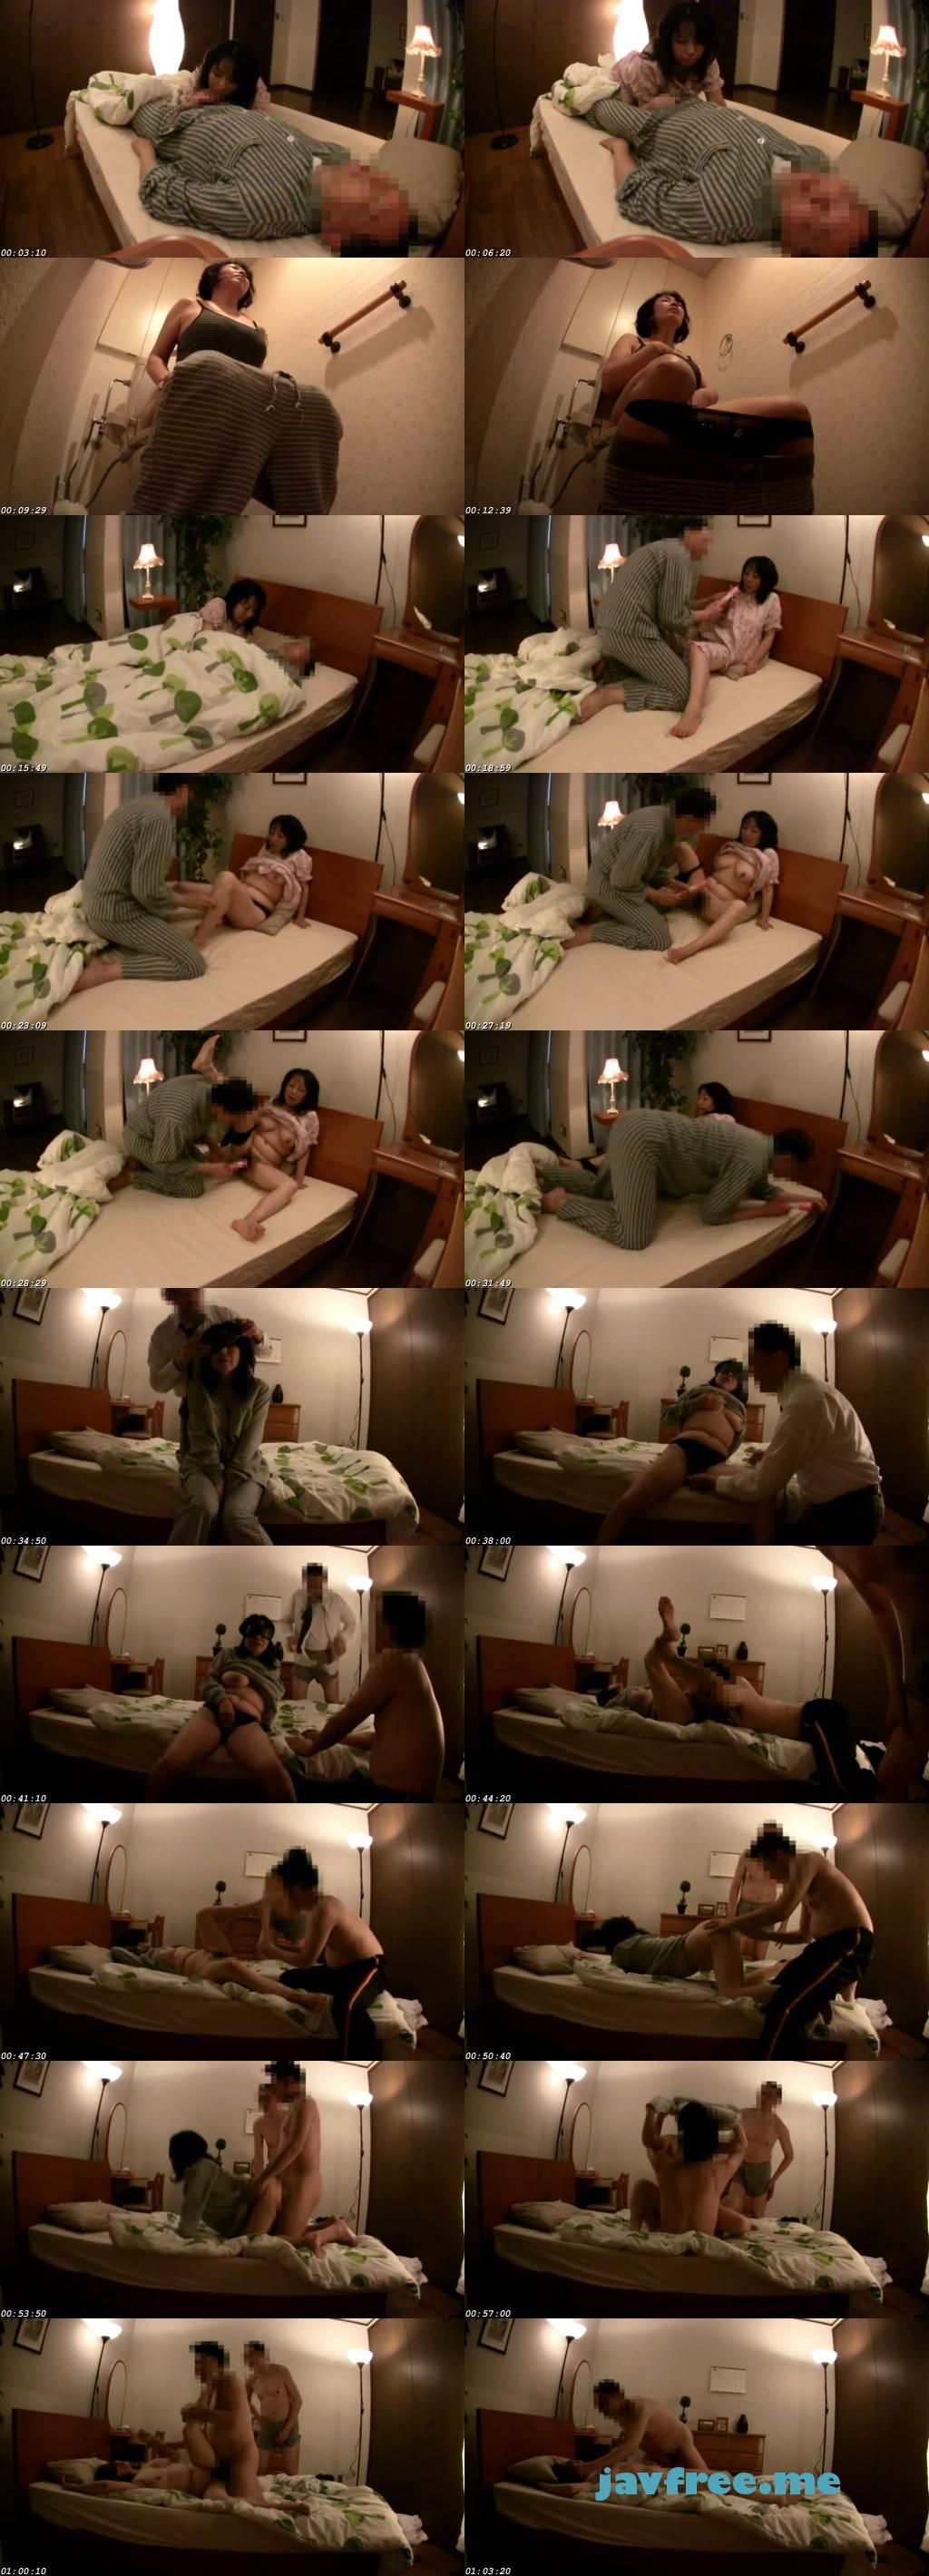 [FUFU 069] 実録 愛する主人の目の前で他人に寝取られる 熟年妻達3時間DX FUFU